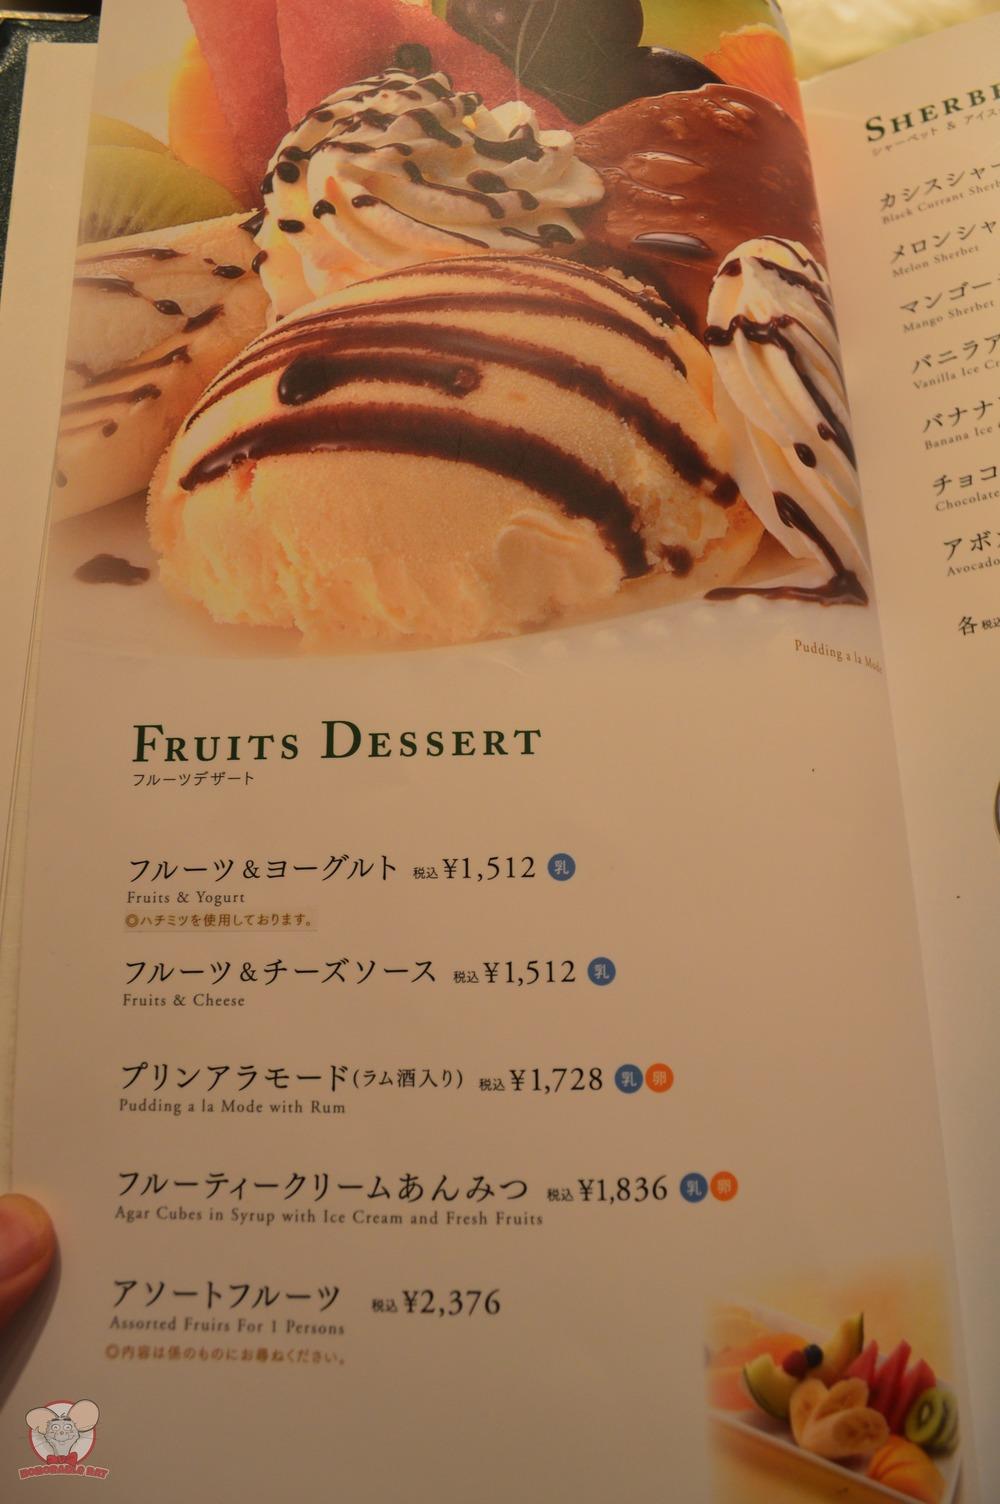 Fruits Dessert Page 1